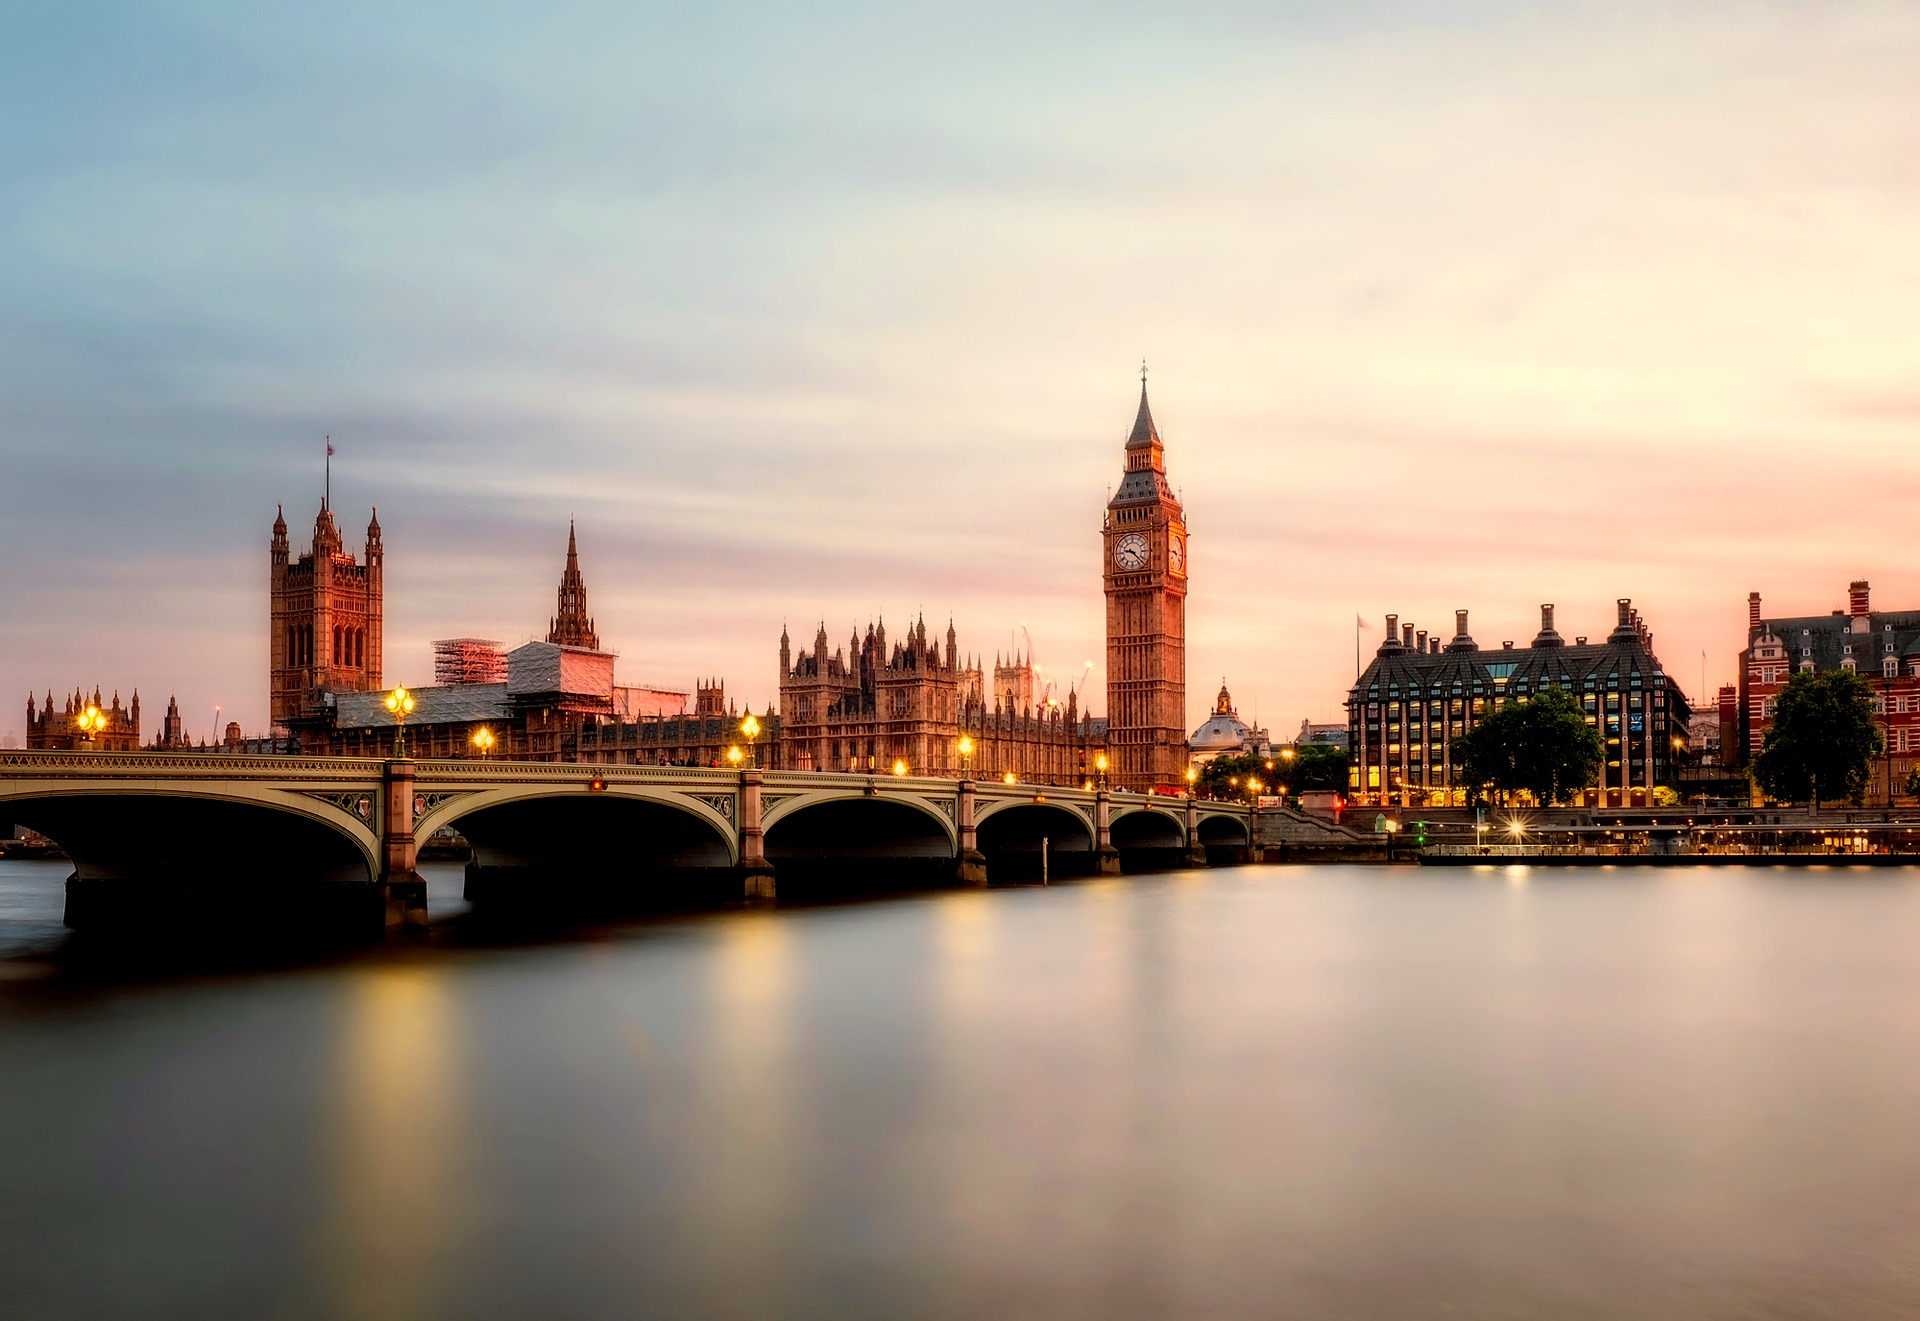 Vertex, NHS England strike CF drugs deal after years of tense negotiations - RapidAPI